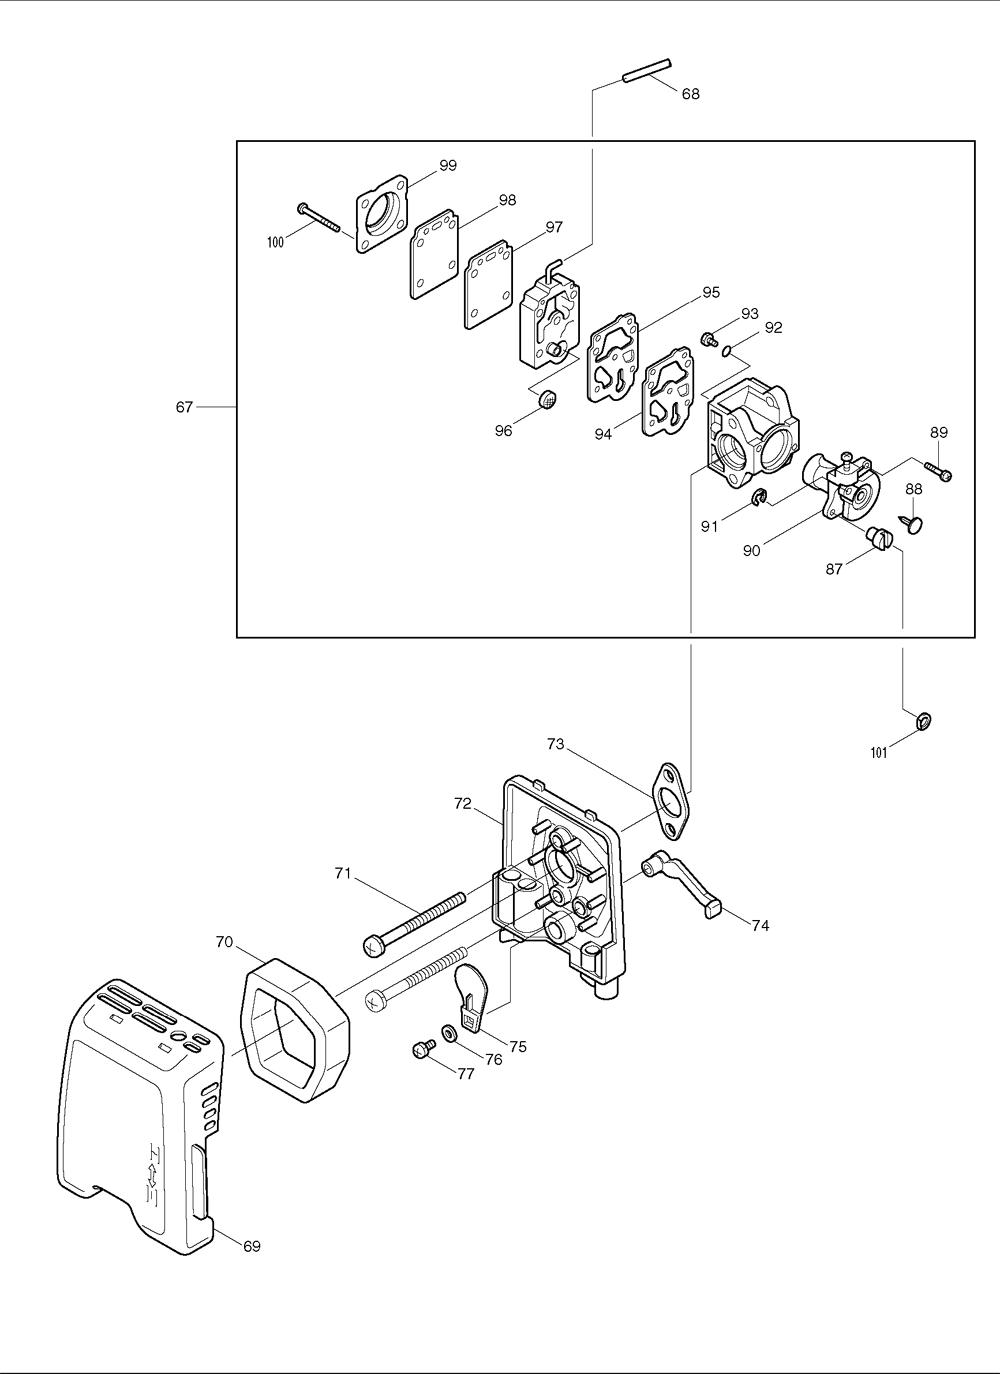 Makita-RST250-224-PBBreak Down